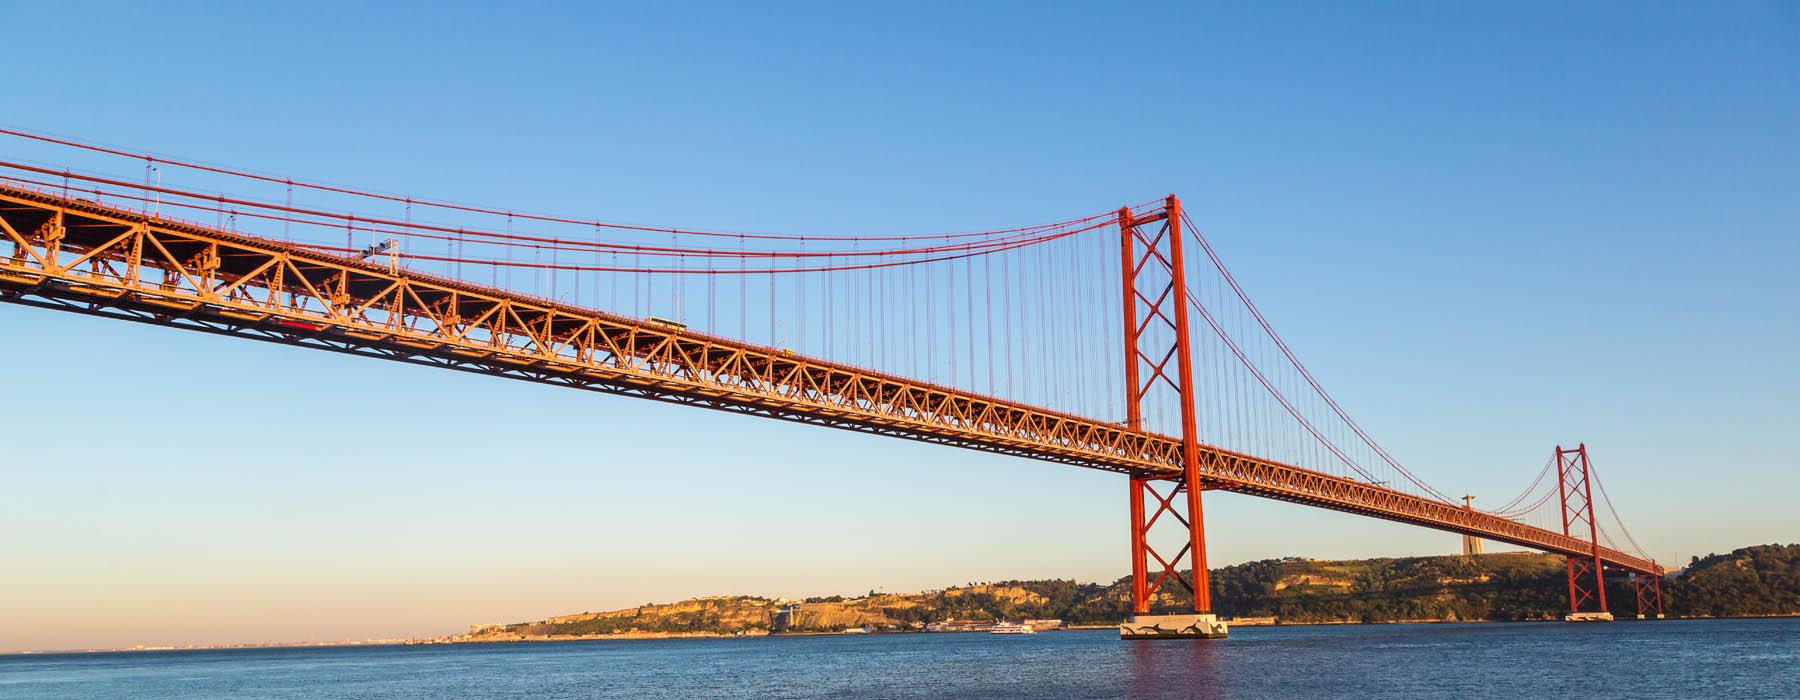 Surroundings of Lisbon